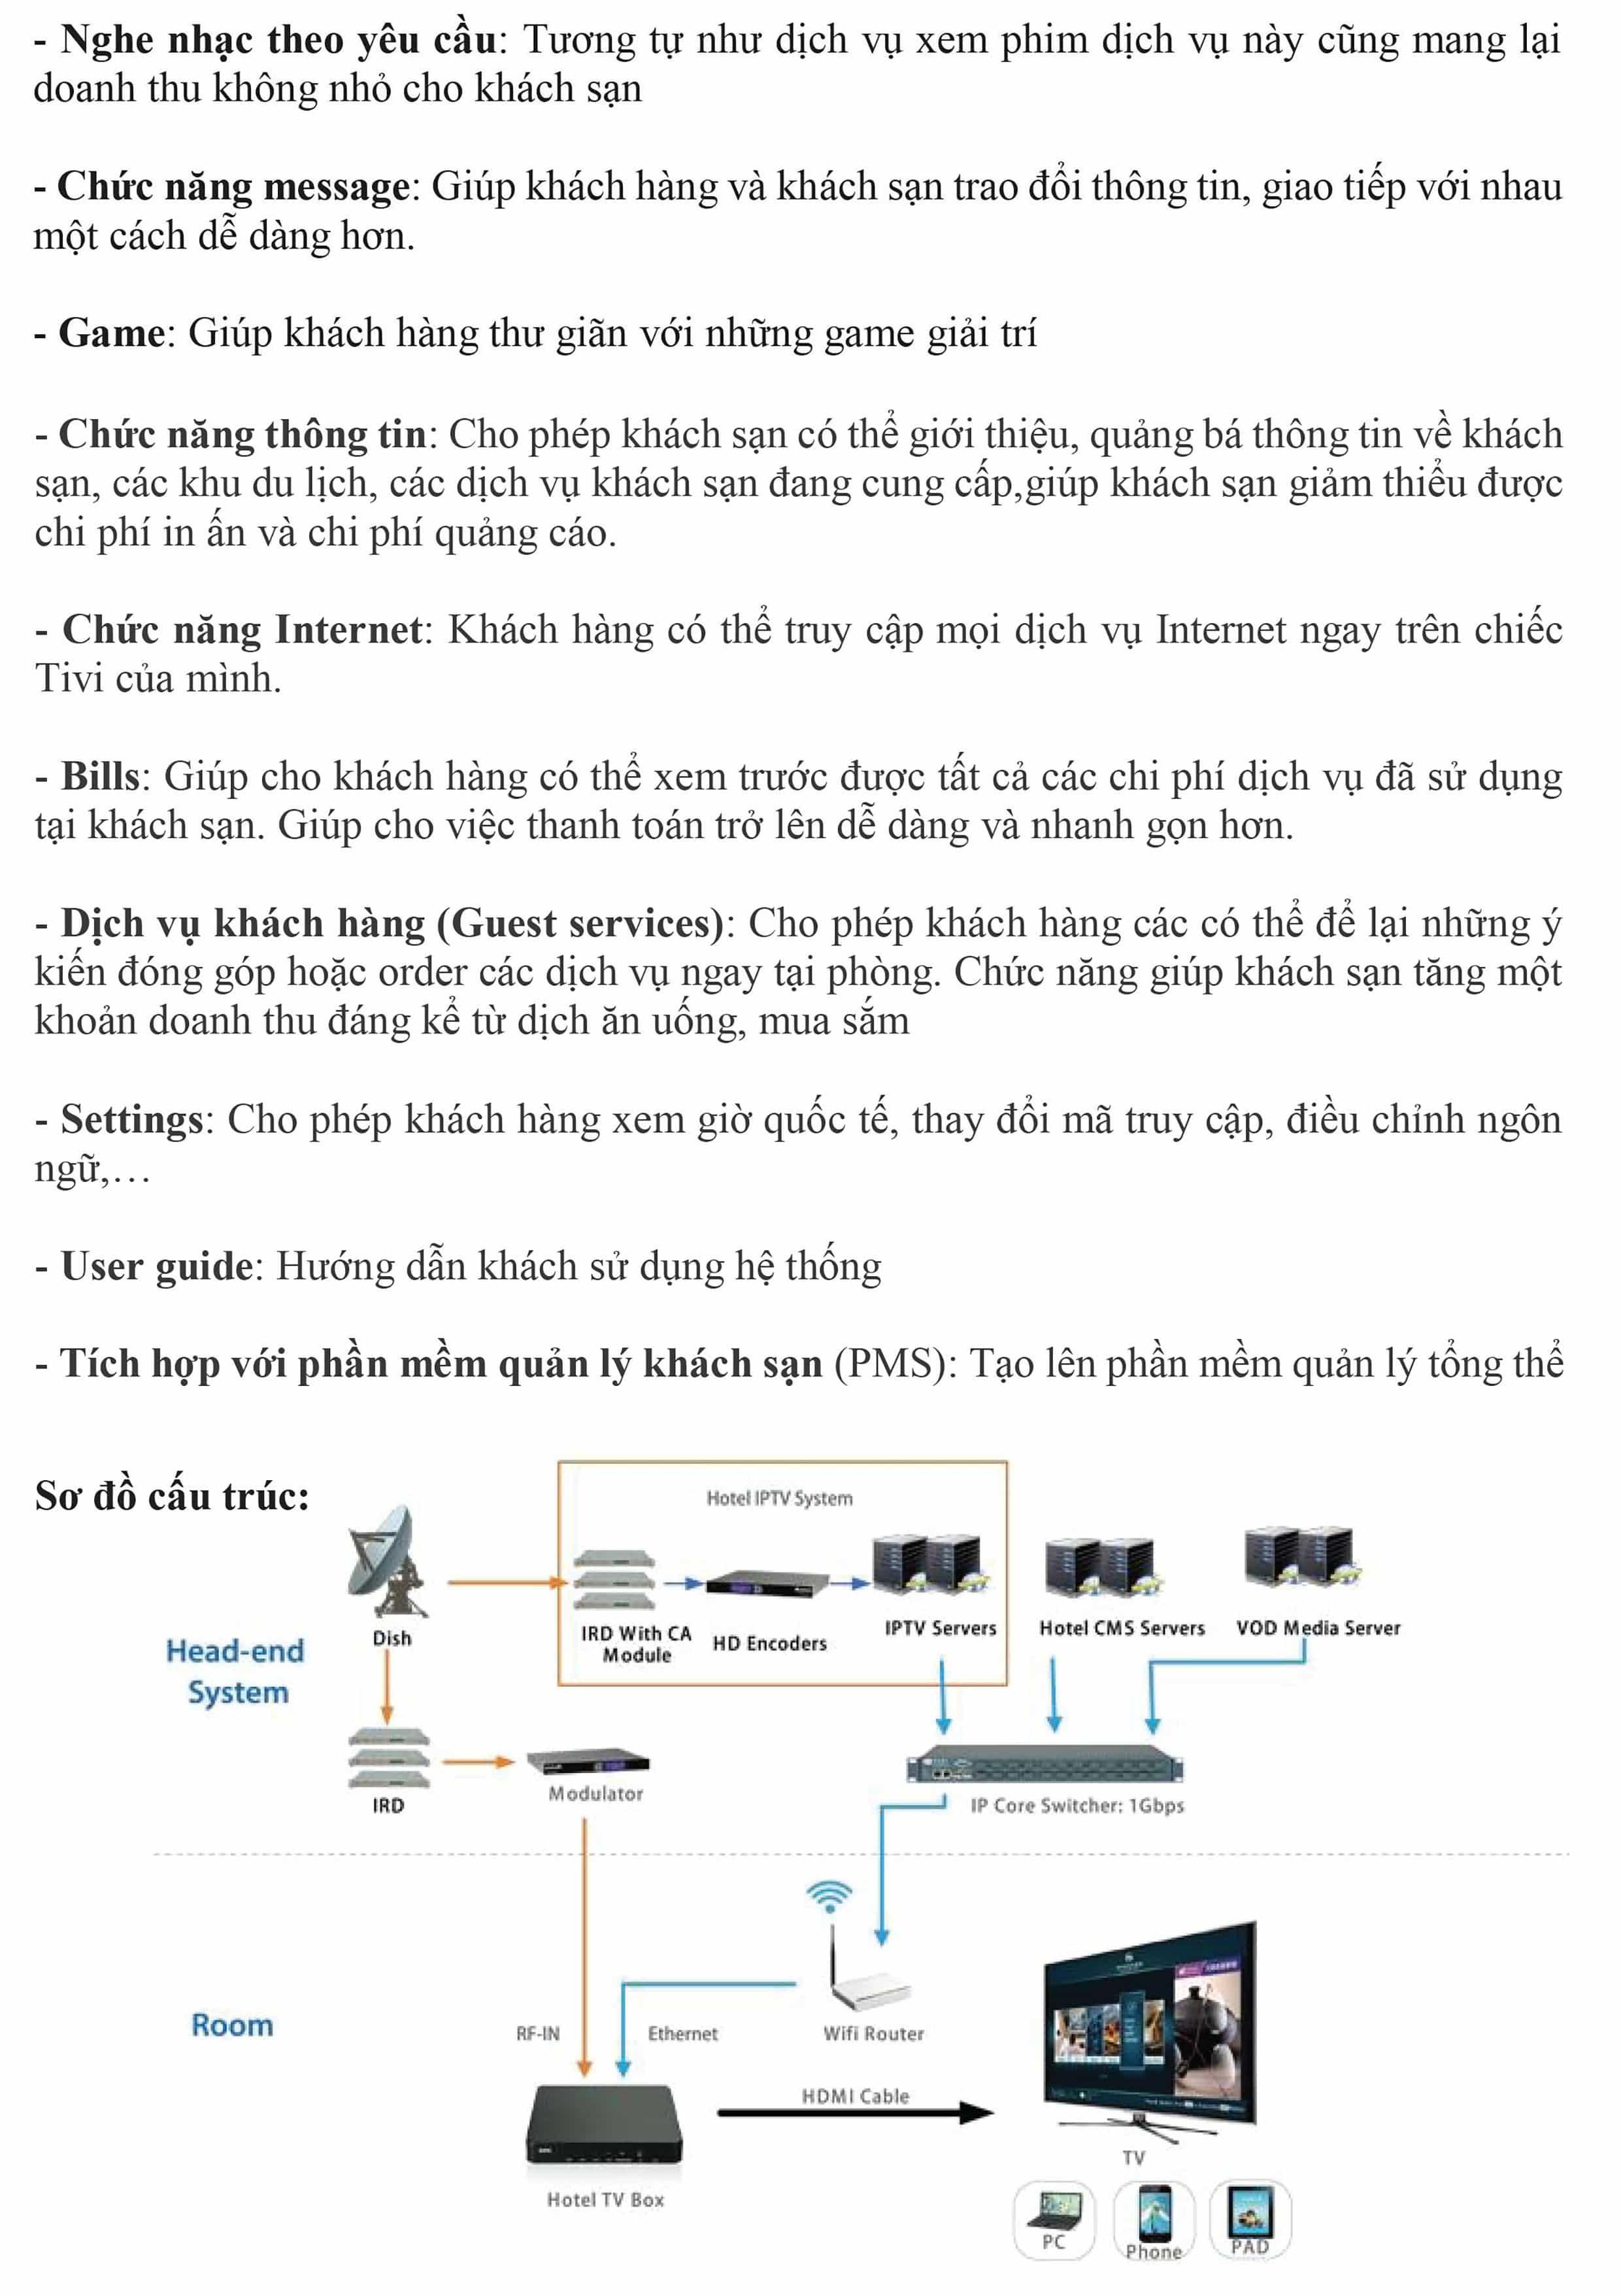 Sơ đồ cấu trúc Giải pháp IPTV